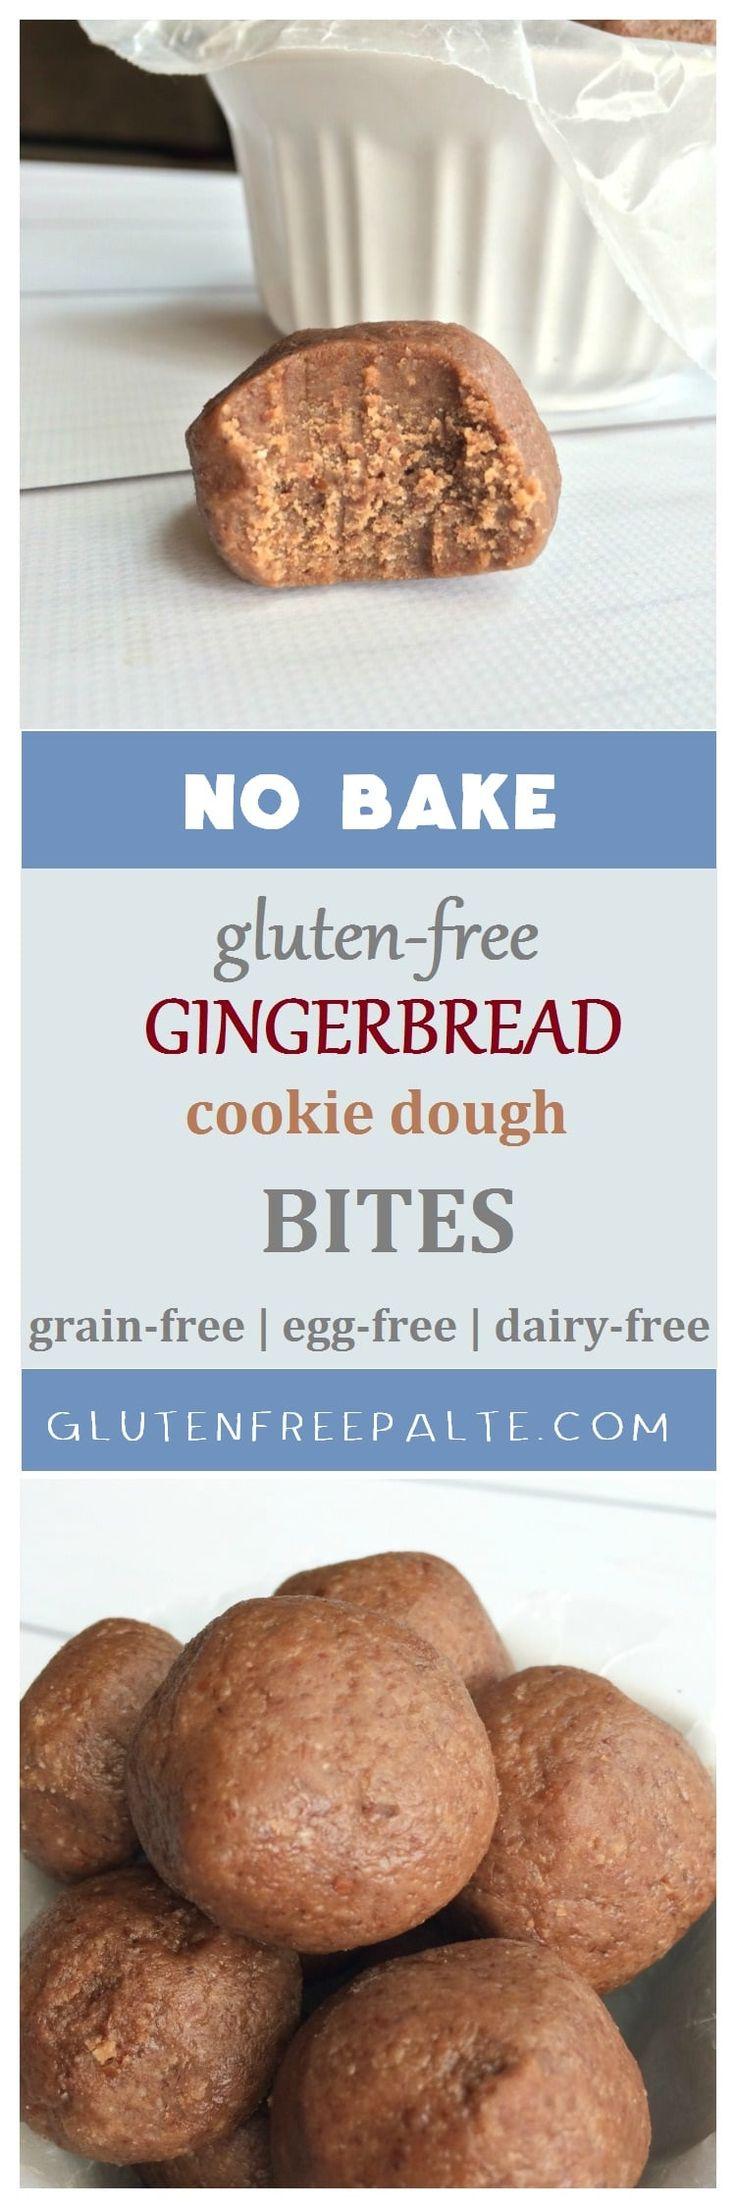 Best 25+ Gluten free cookie dough ideas on Pinterest ...